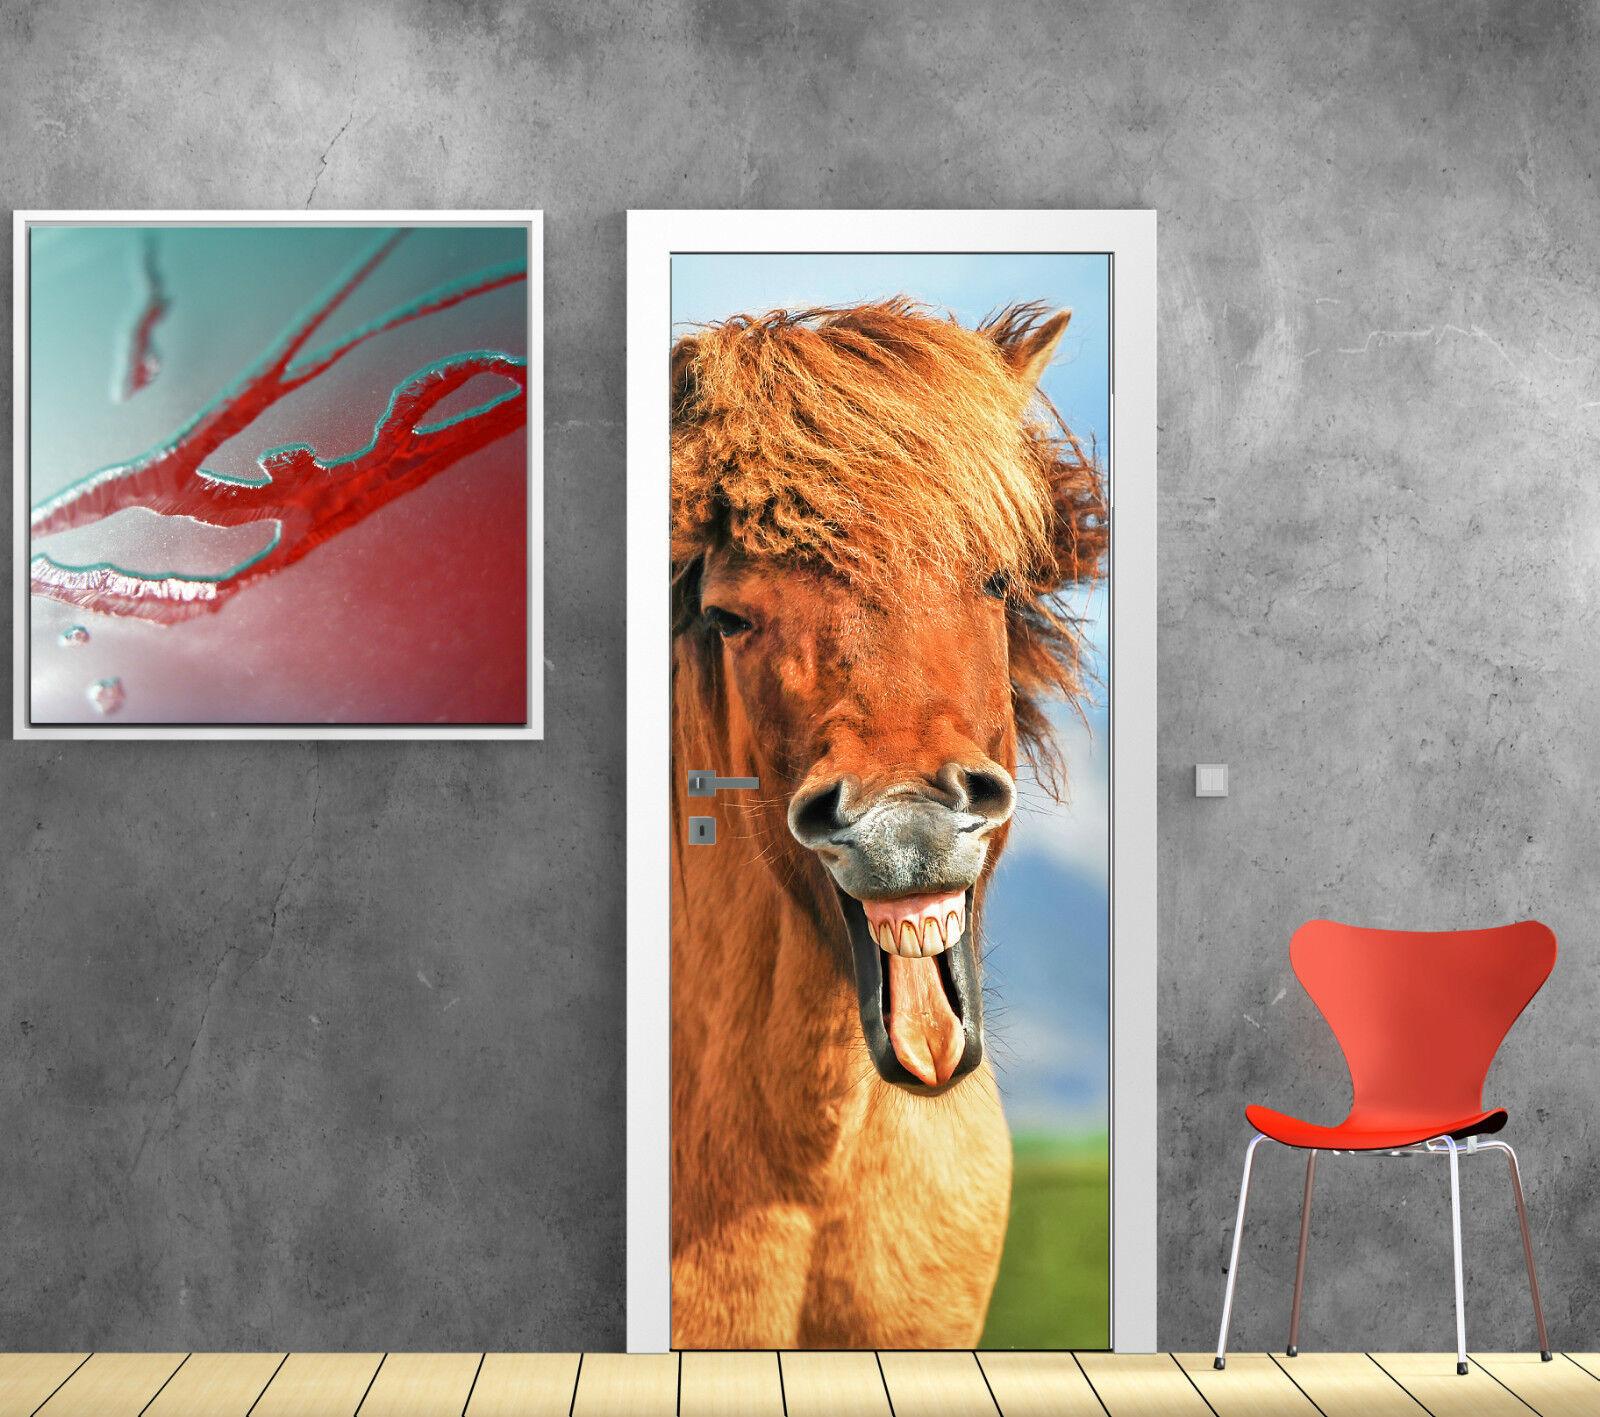 Adhesivo mane para puertas caballo bonito mane Adhesivo ref 850 b98d02